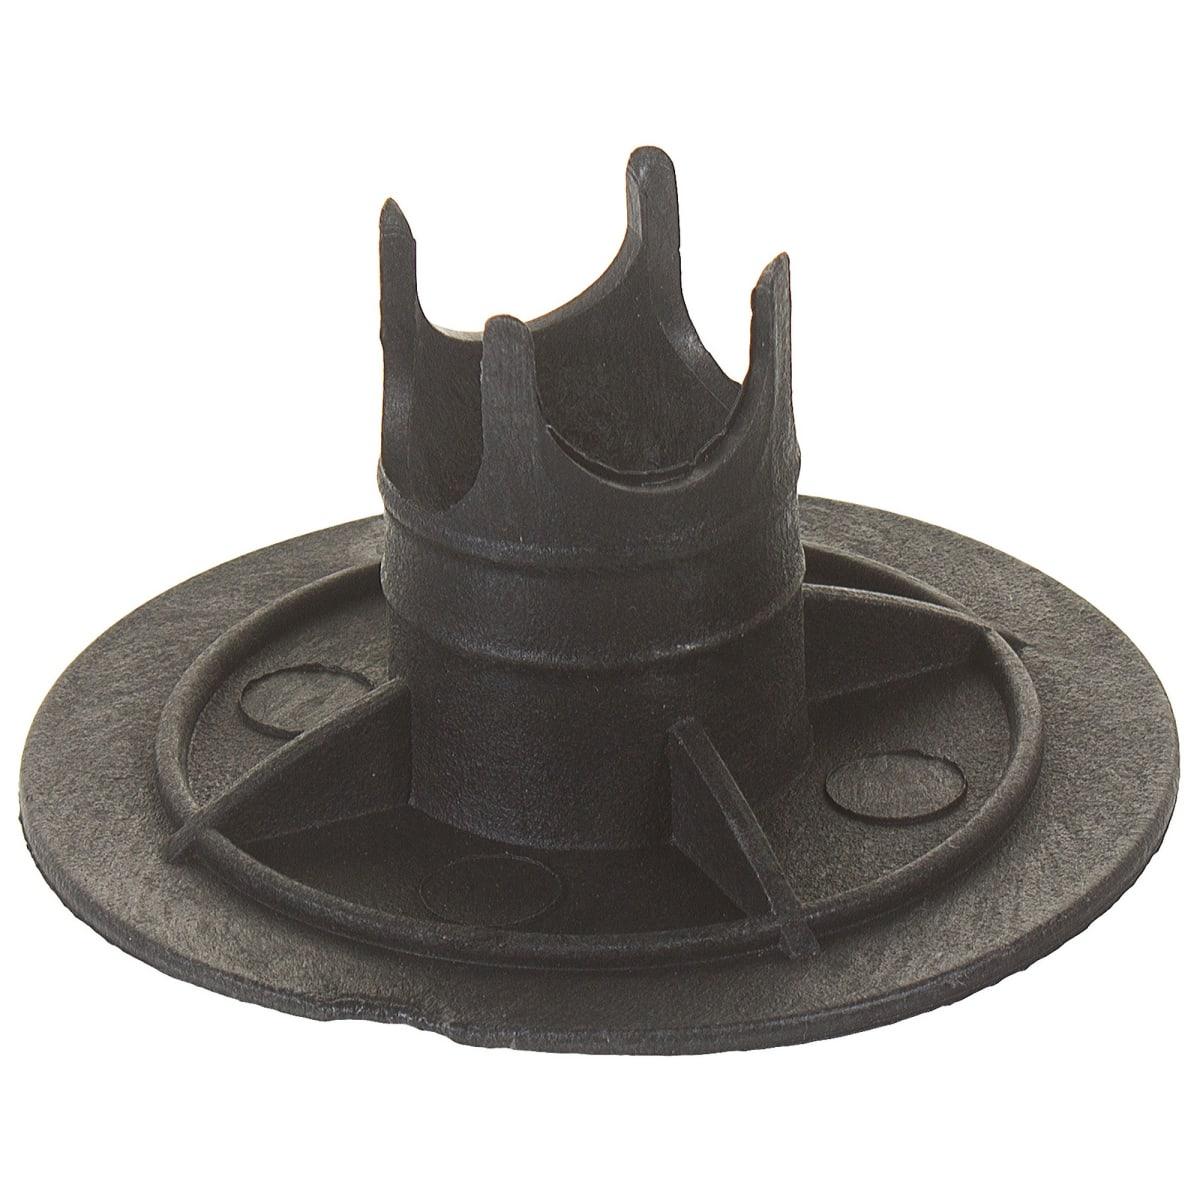 Фиксатор для арматуры в грунт, 90х60 мм, пластмасса, 5 шт.